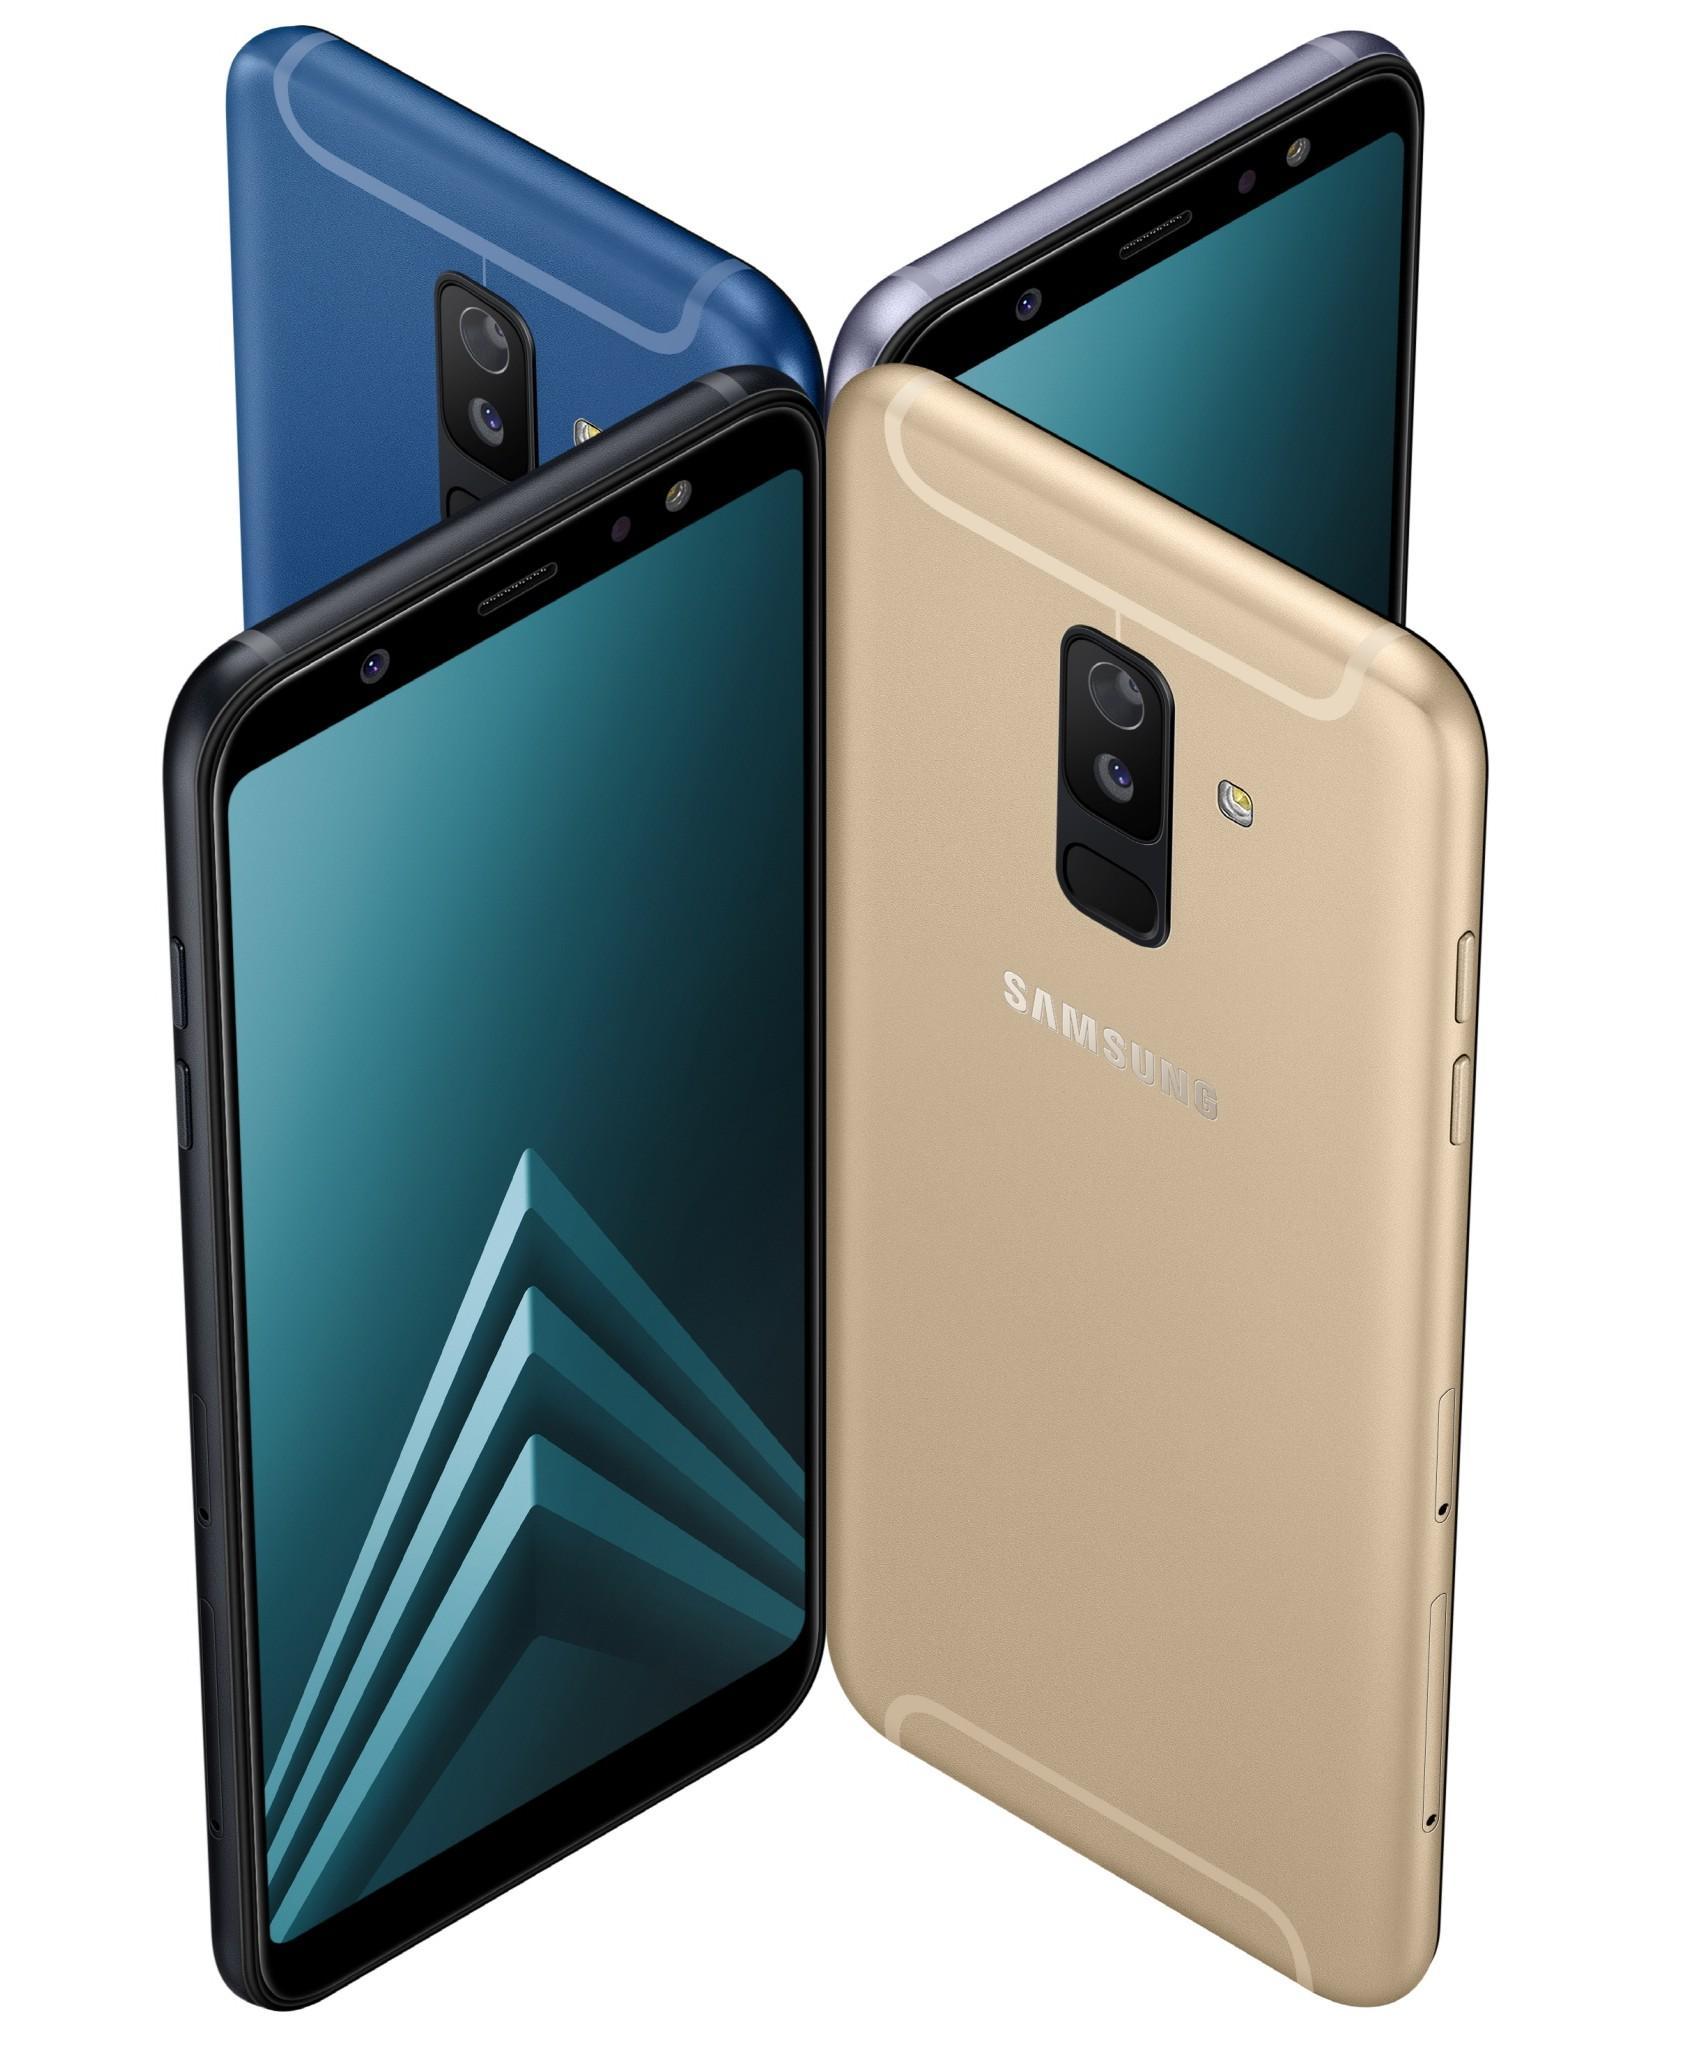 Samsung представила Galaxy A6 и Galaxy A6+ с Infinity дисплеем и мощной фронталкой